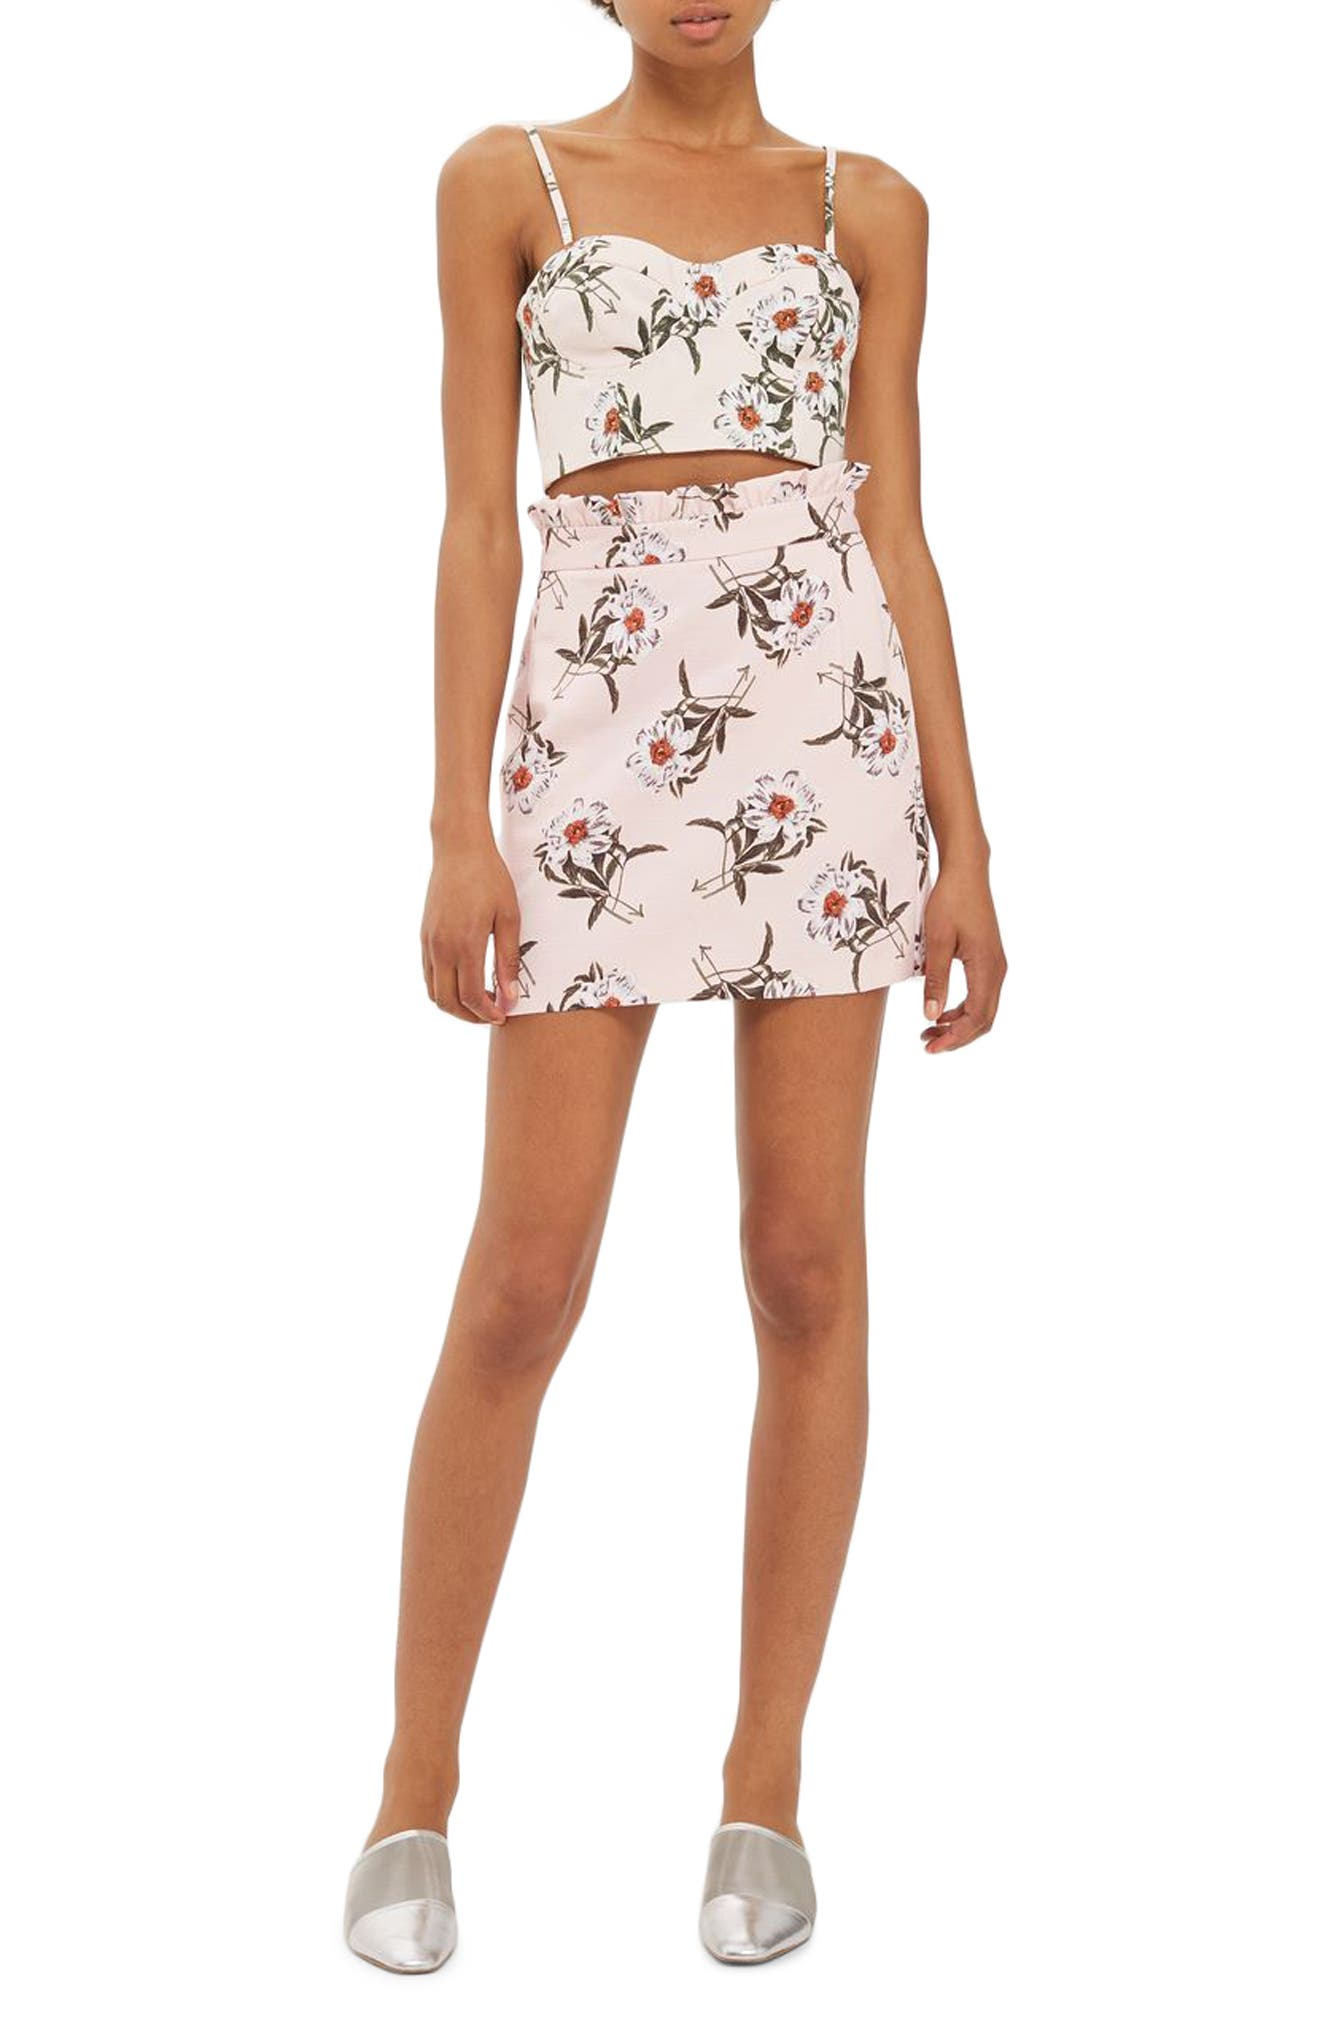 Topshop Daisy Print Miniskirt